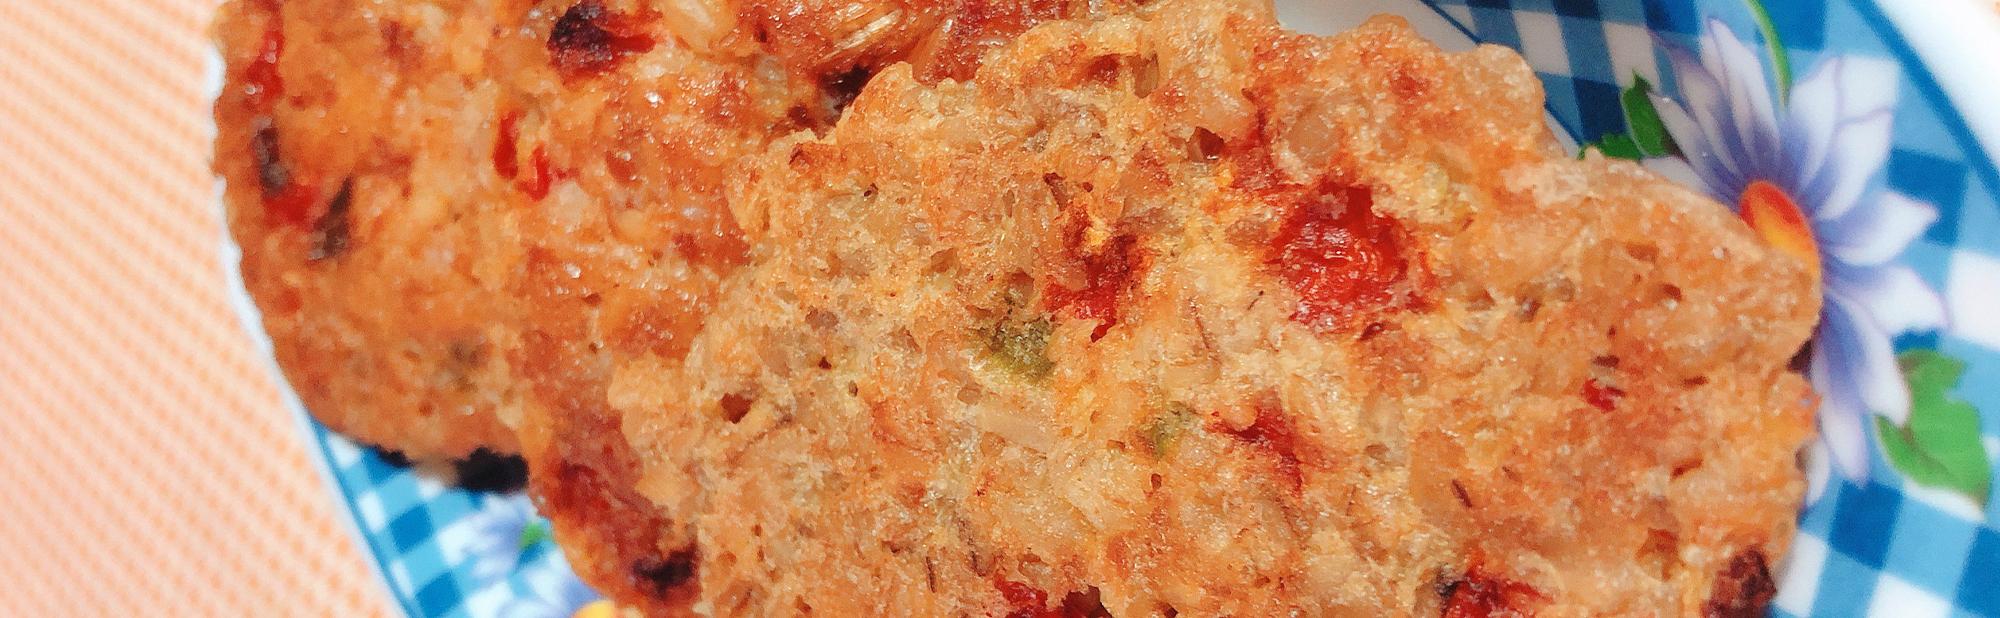 La Antojadera | Oatmeal Pancakes